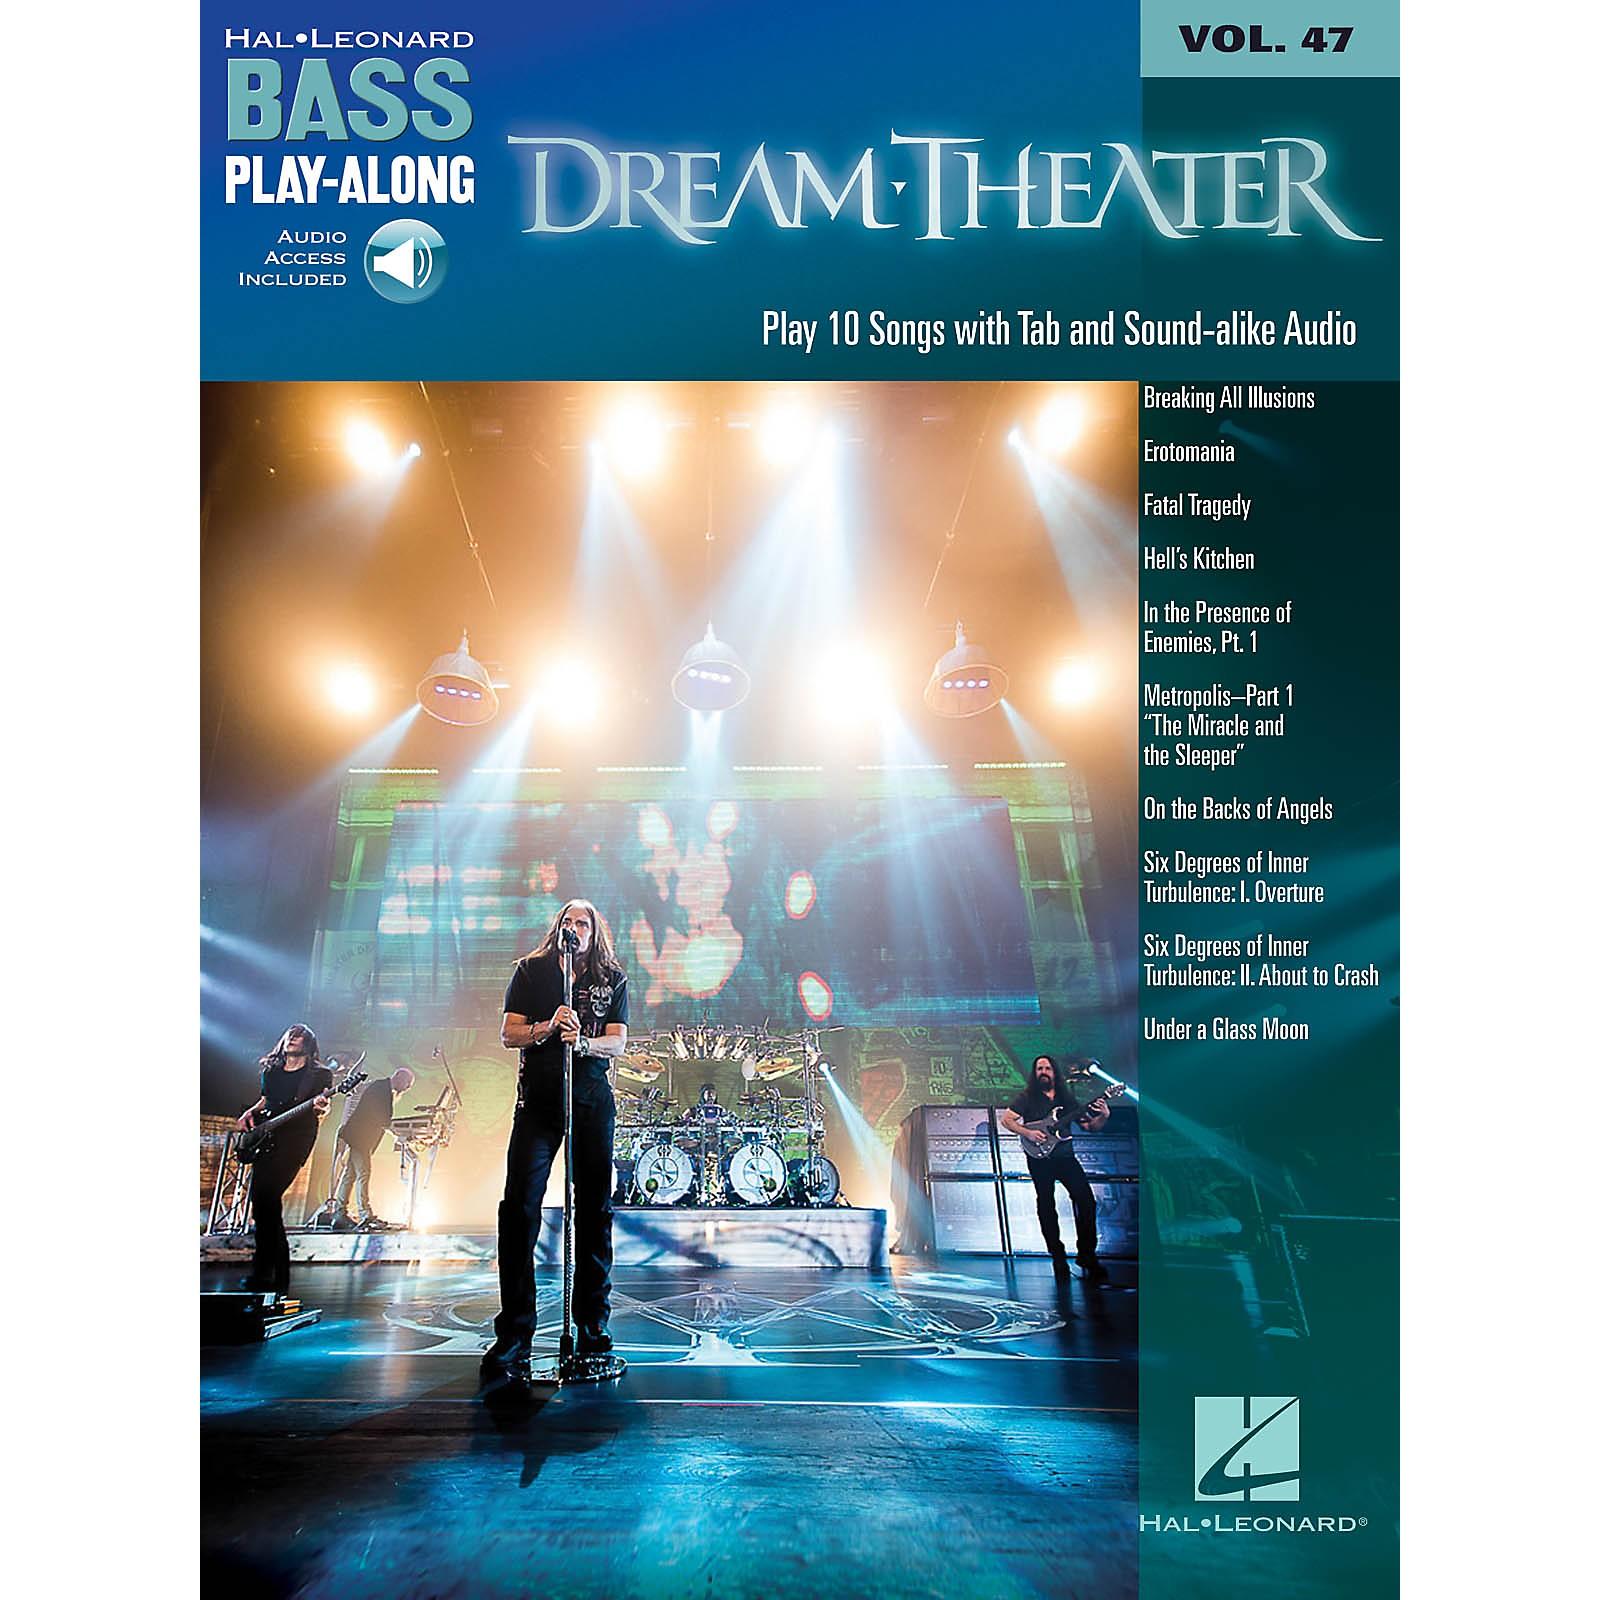 Hal Leonard Dream Theater (Bass Play-Along Volume 47 Book/Online Audio) Bass Play-Along Series Softcover Audio Online